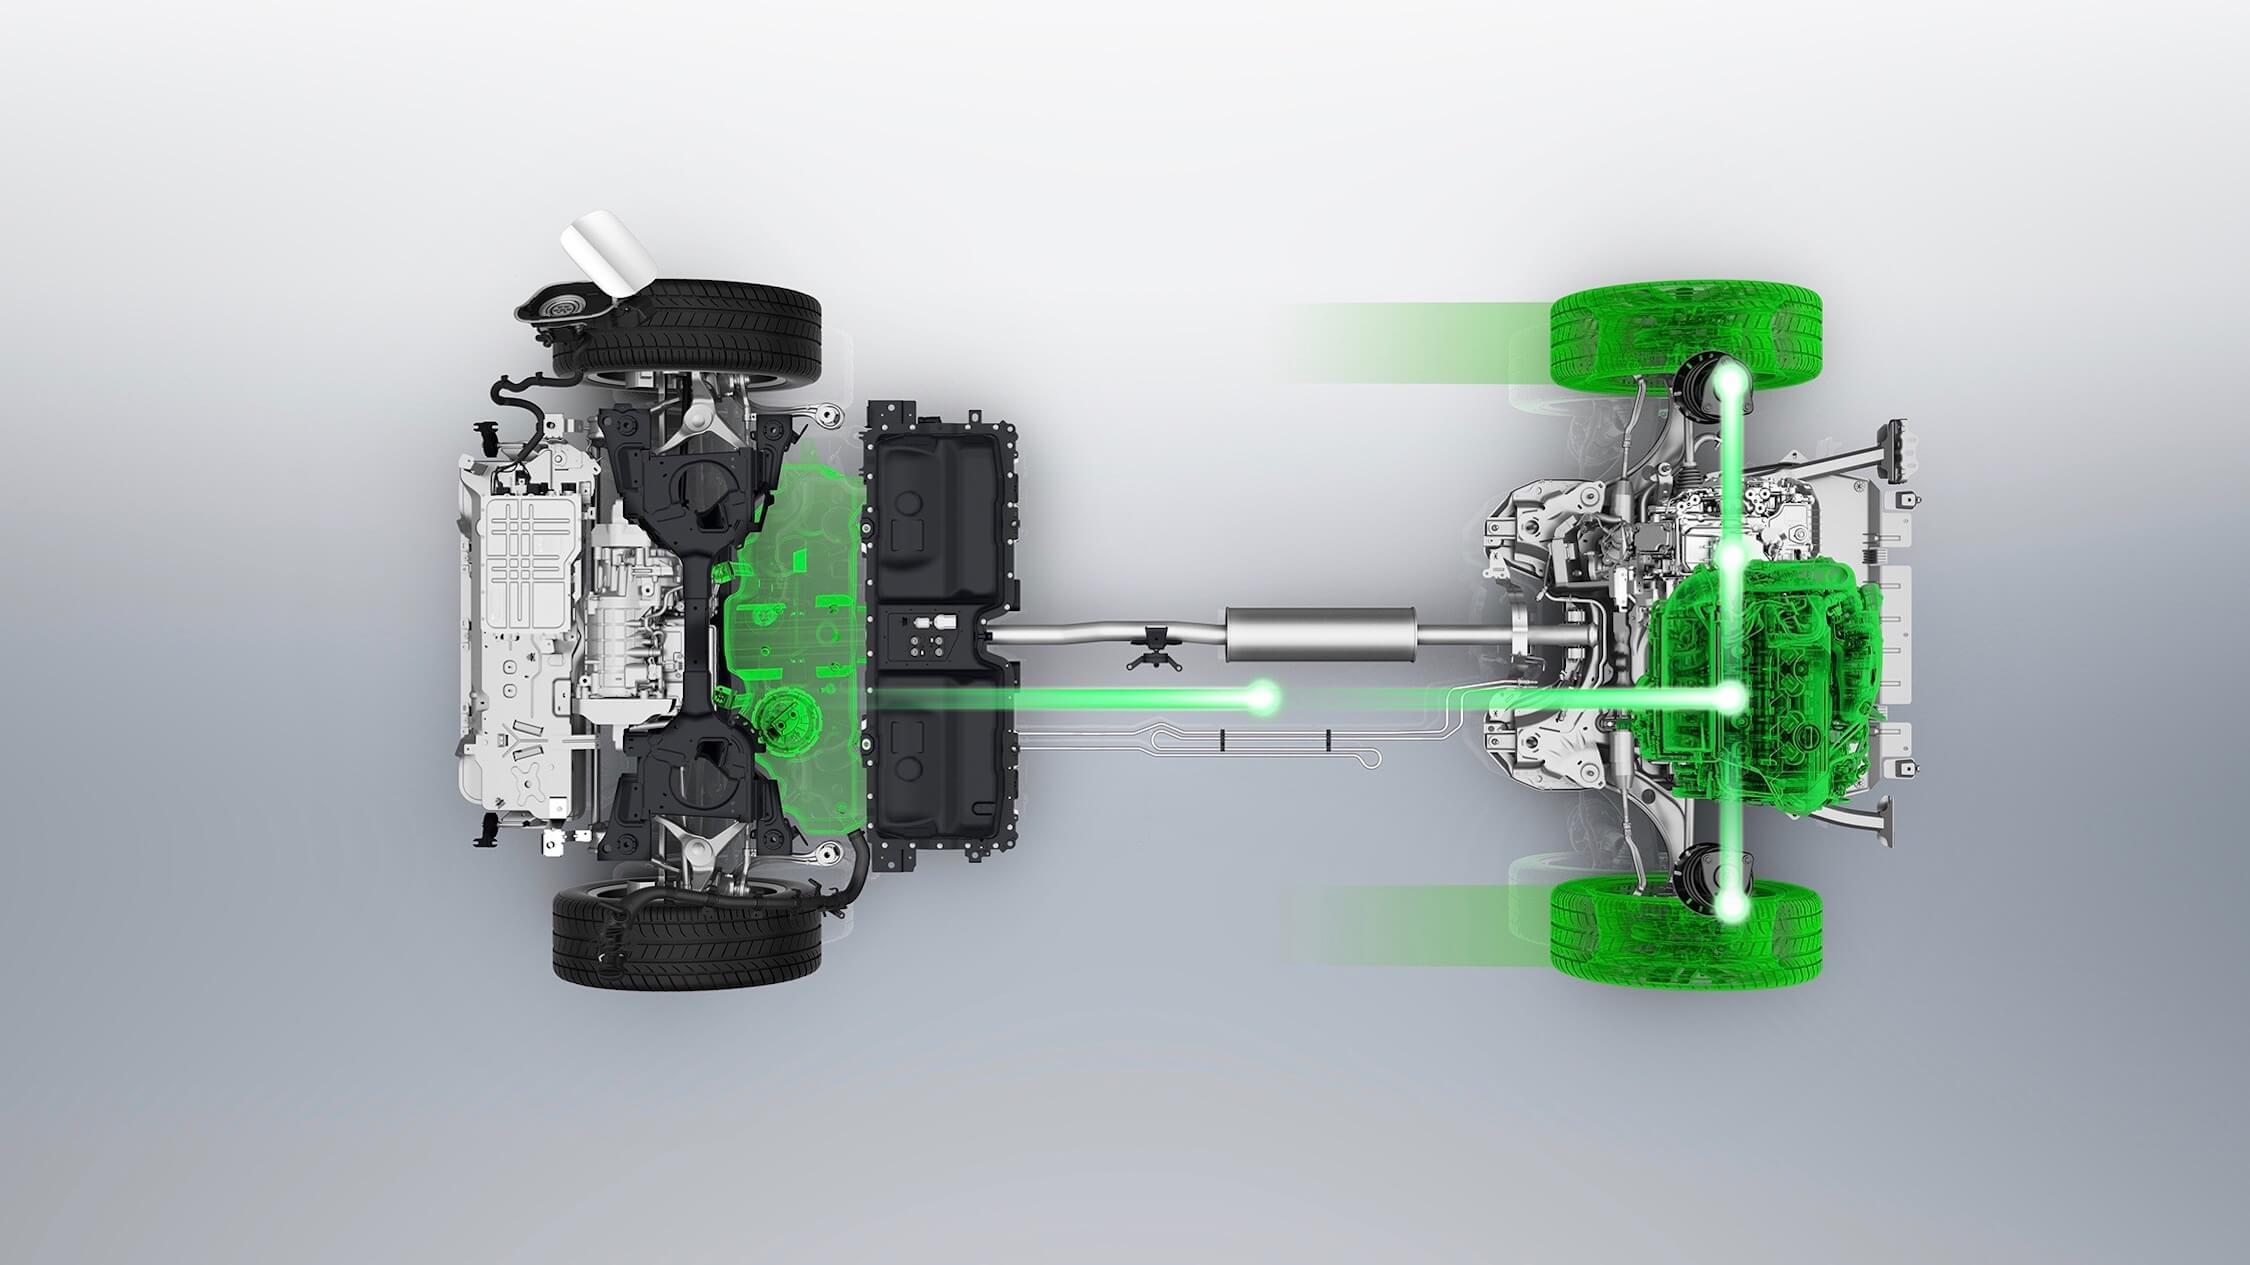 Peugeot 3008 Hybride drivetrain